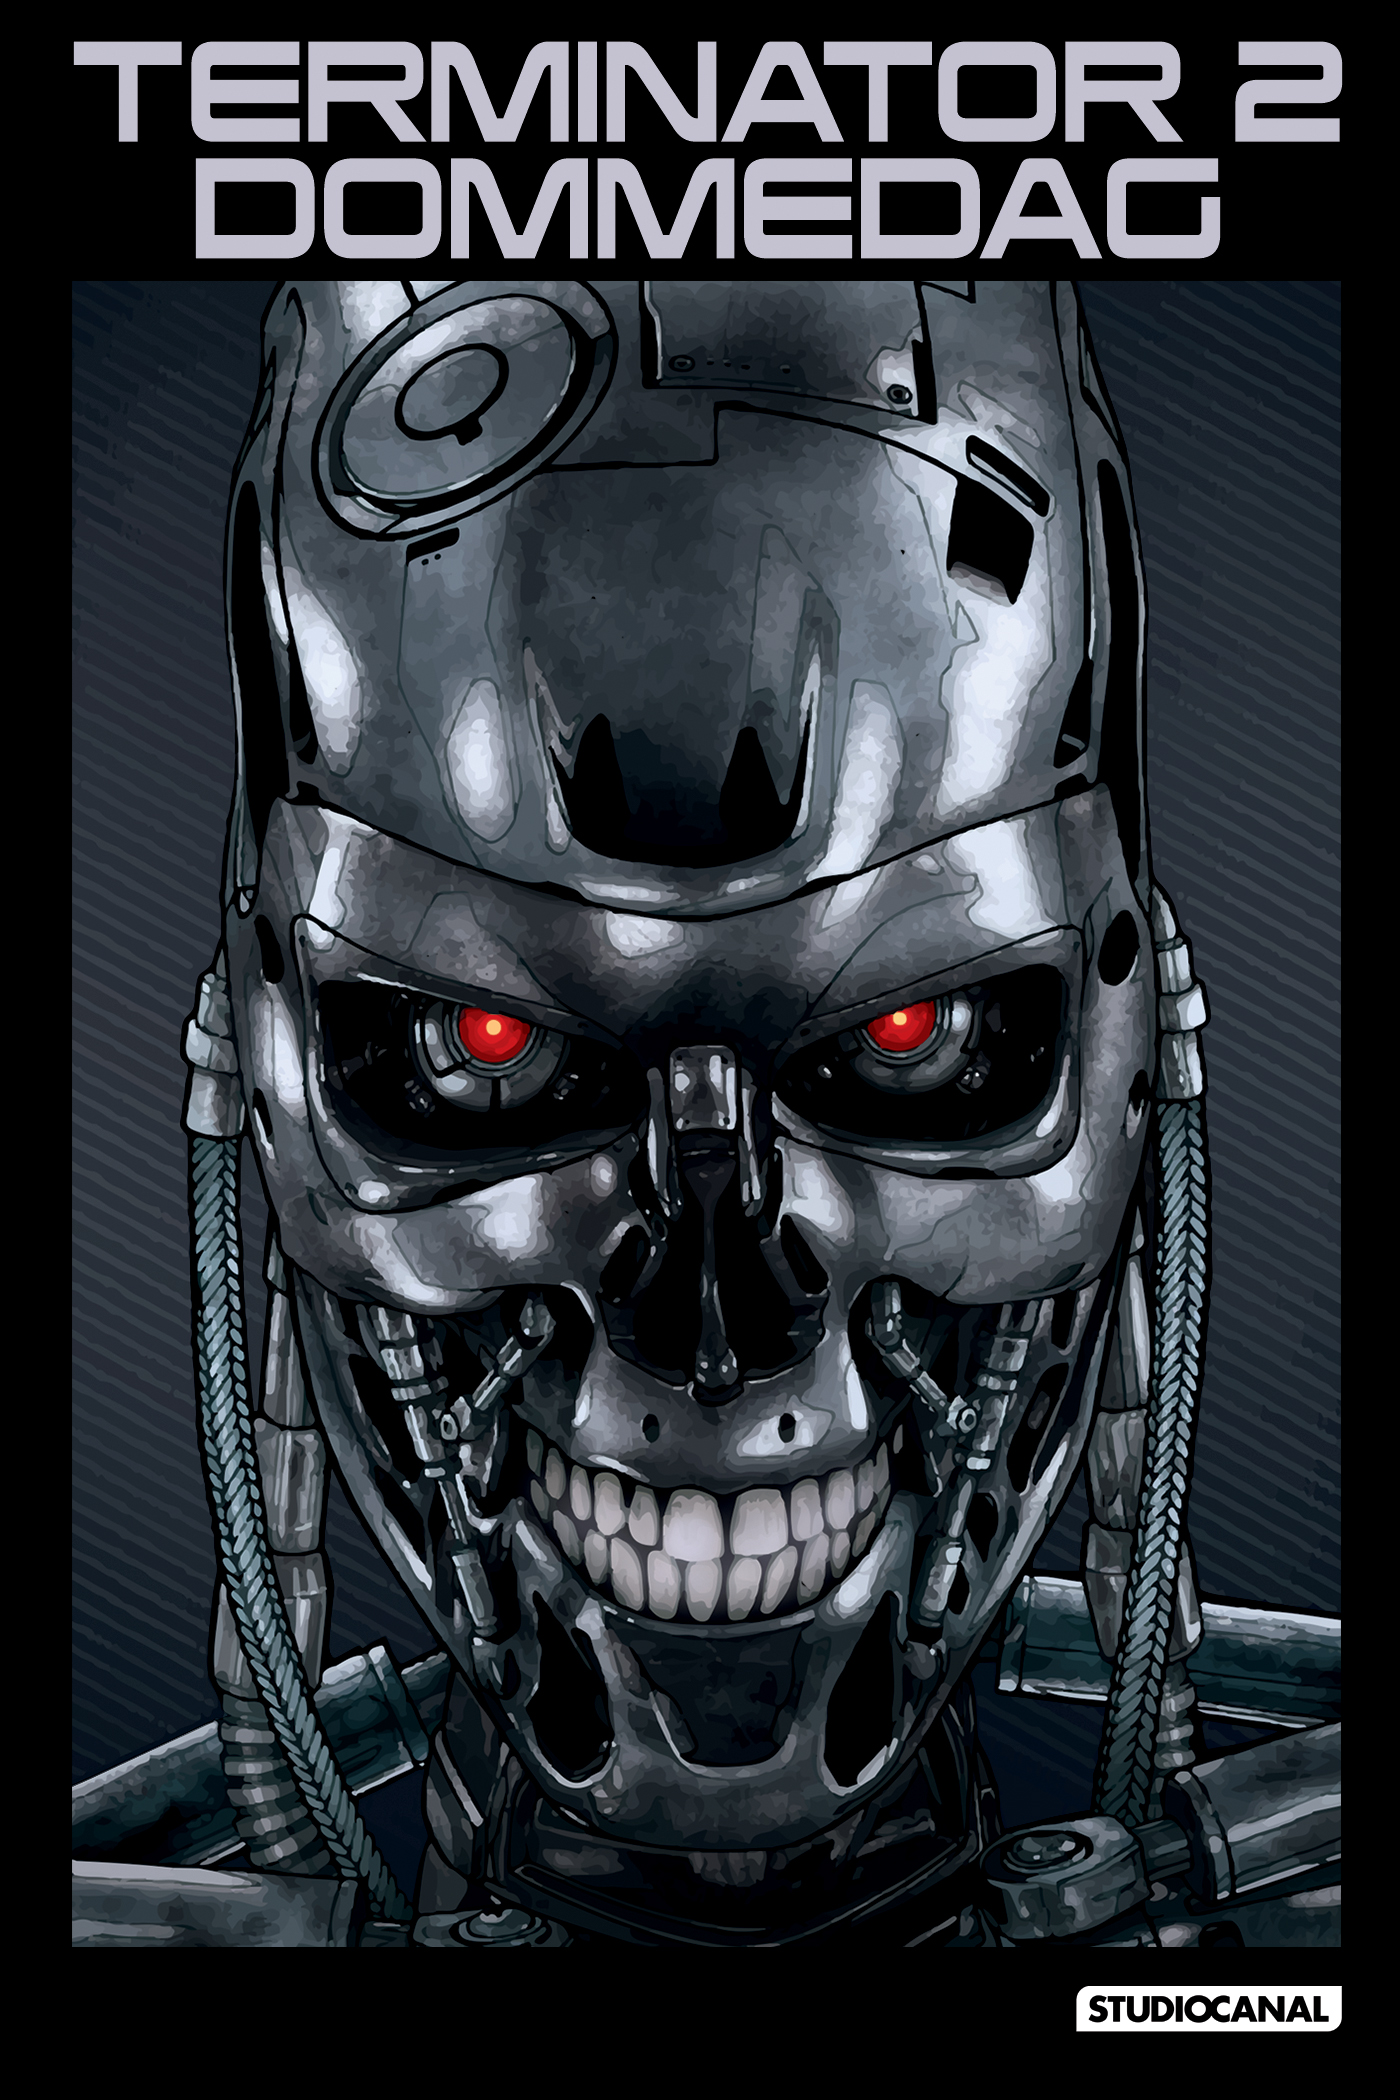 Title :Terminator 2: Dommedag